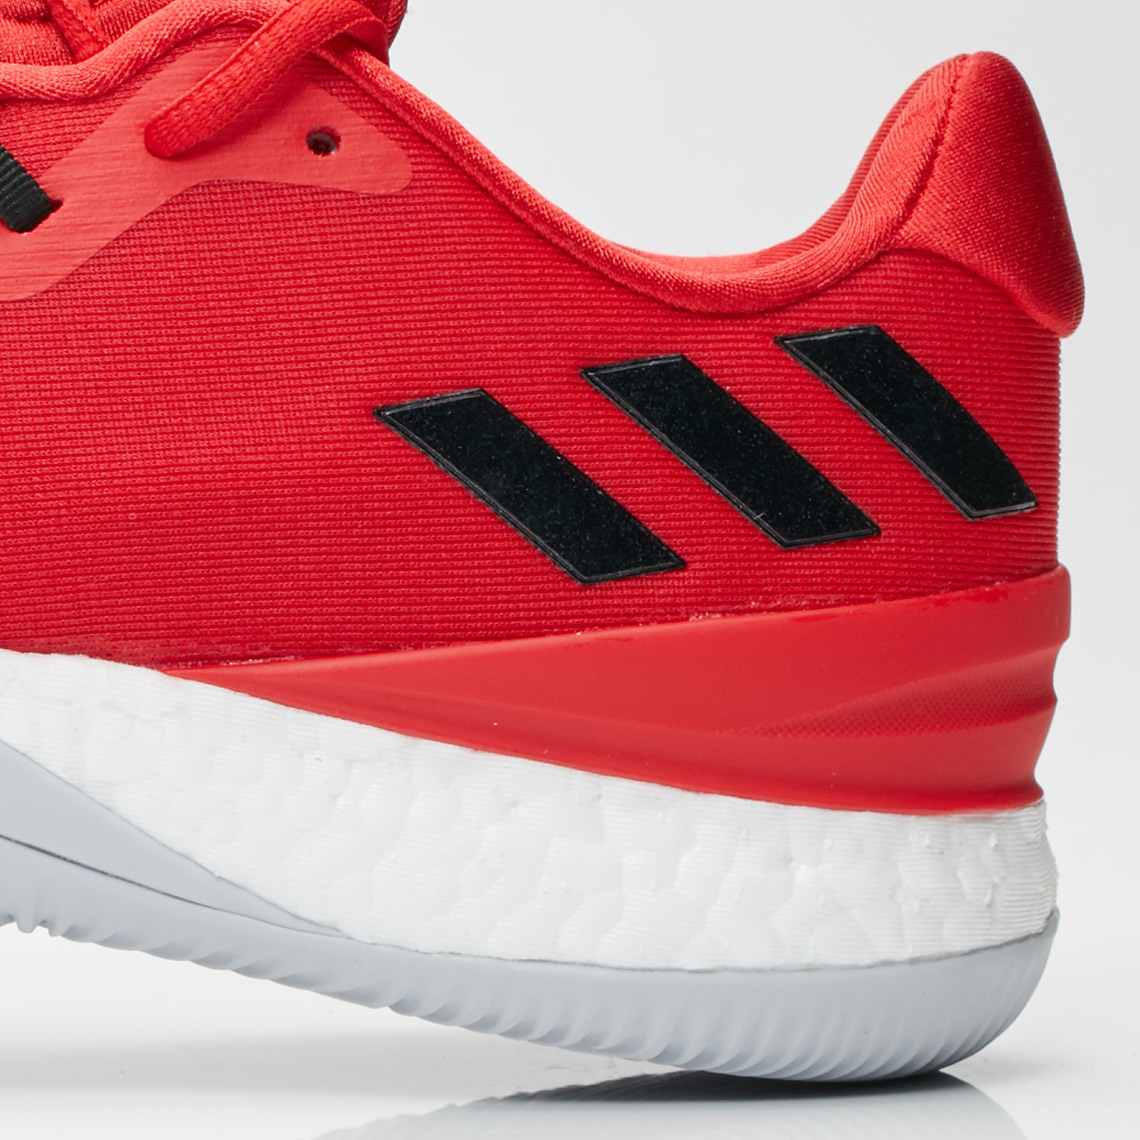 adidas Crazy Light Boost 2 DB1068+DB1069 |